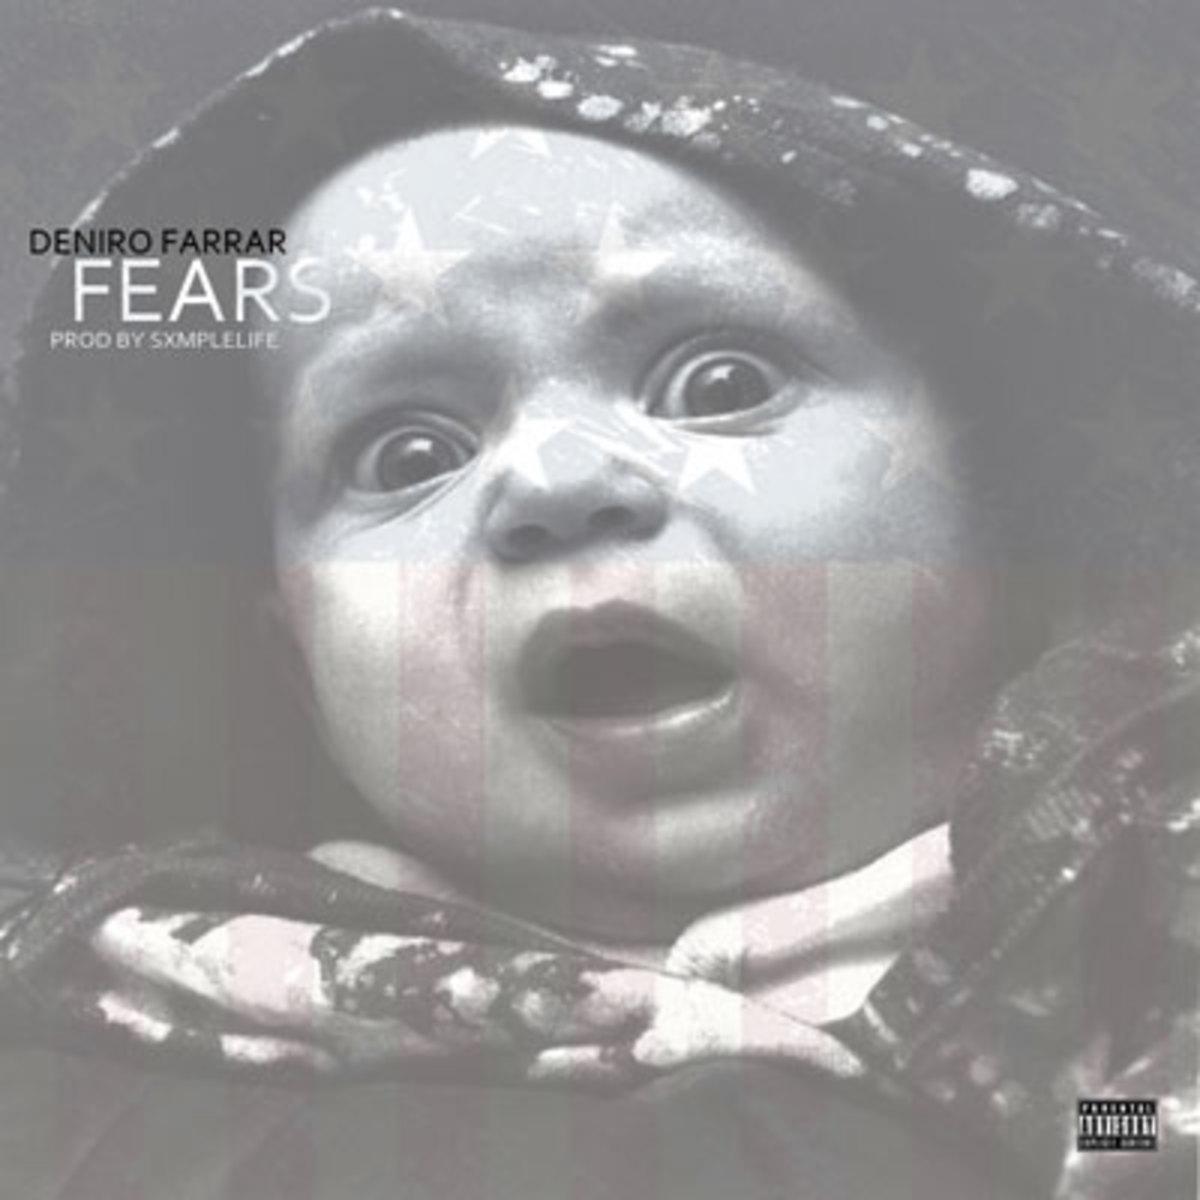 denirofarrar-fears.jpg